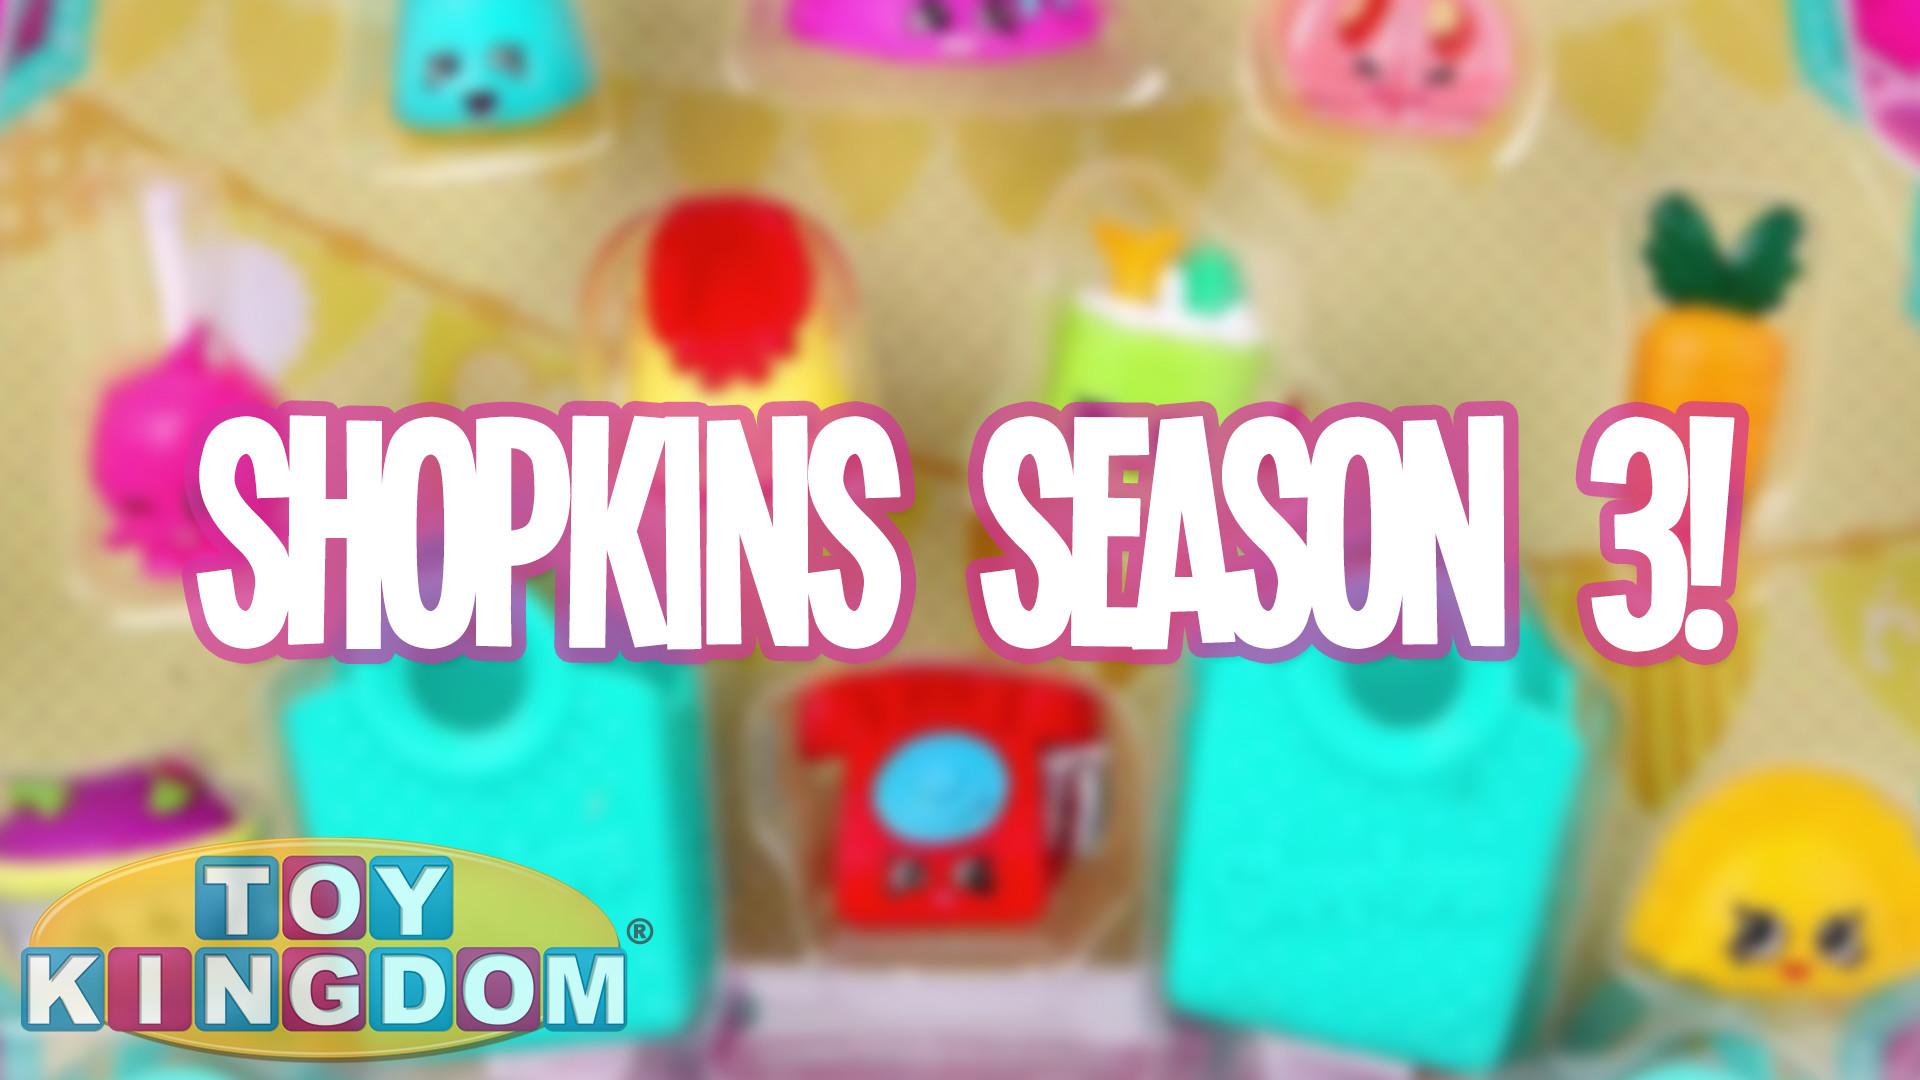 Shopkins Season 3 News and Release Date Info